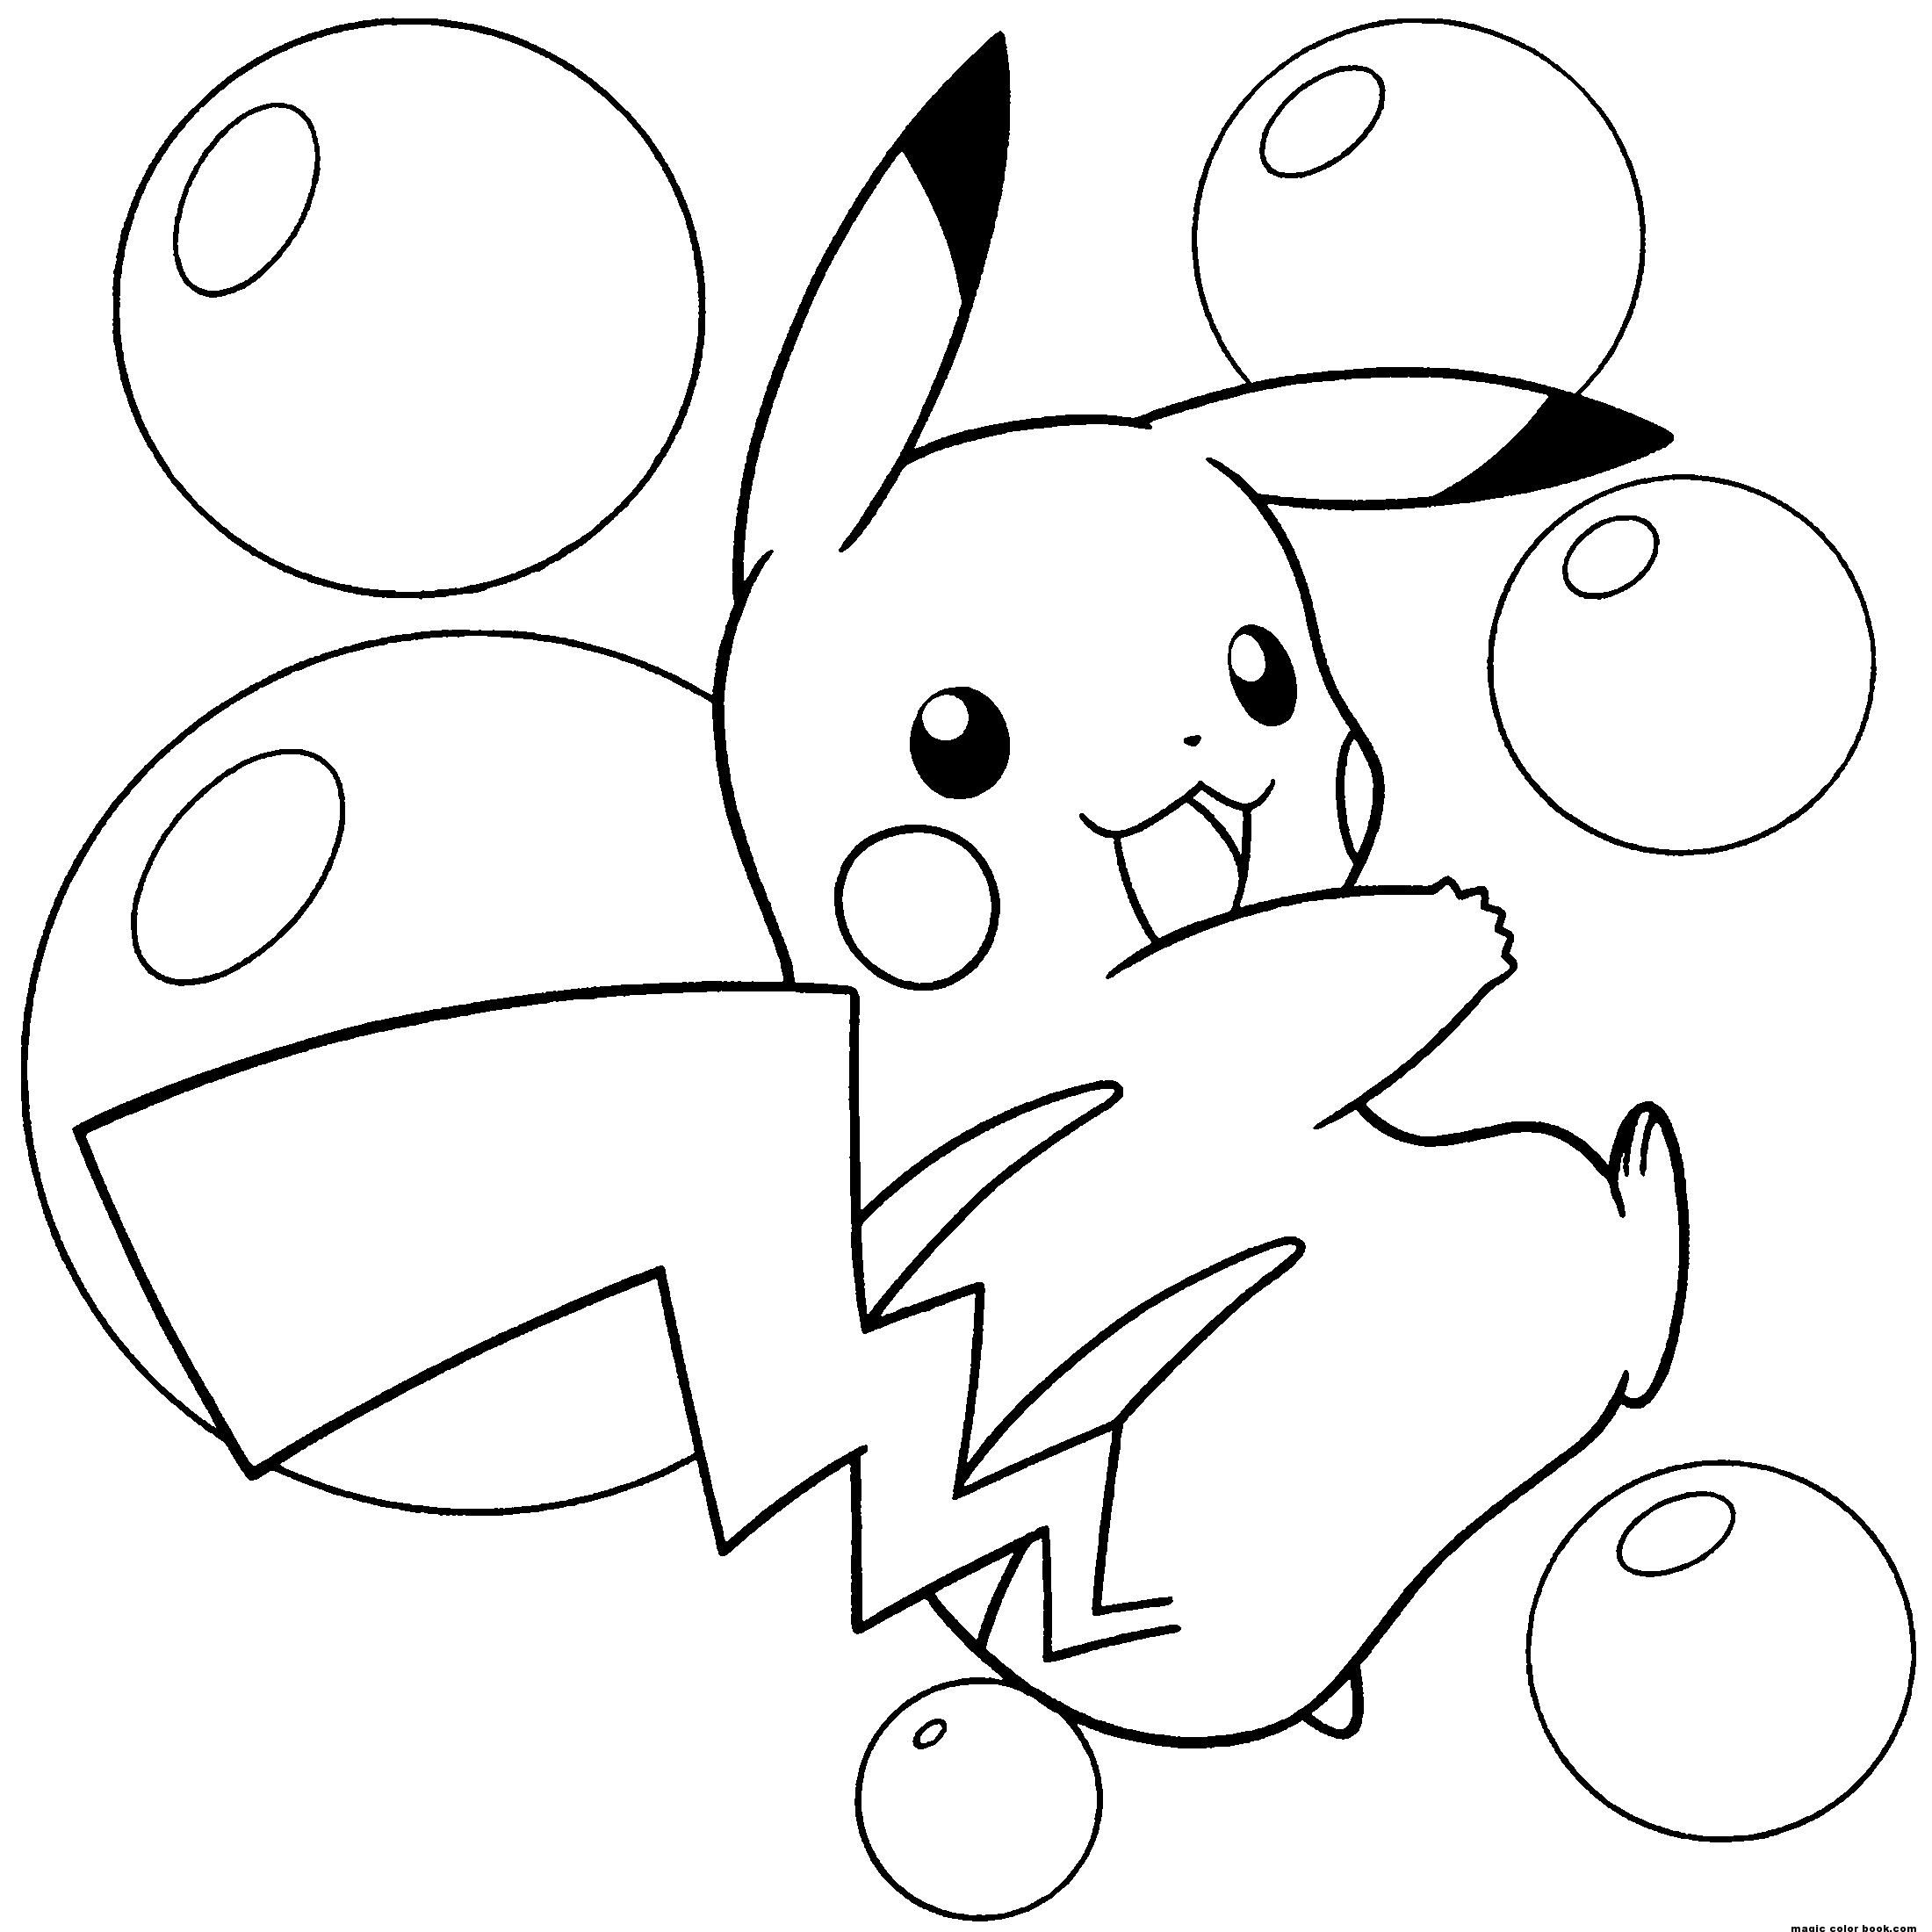 Attention Pikachu